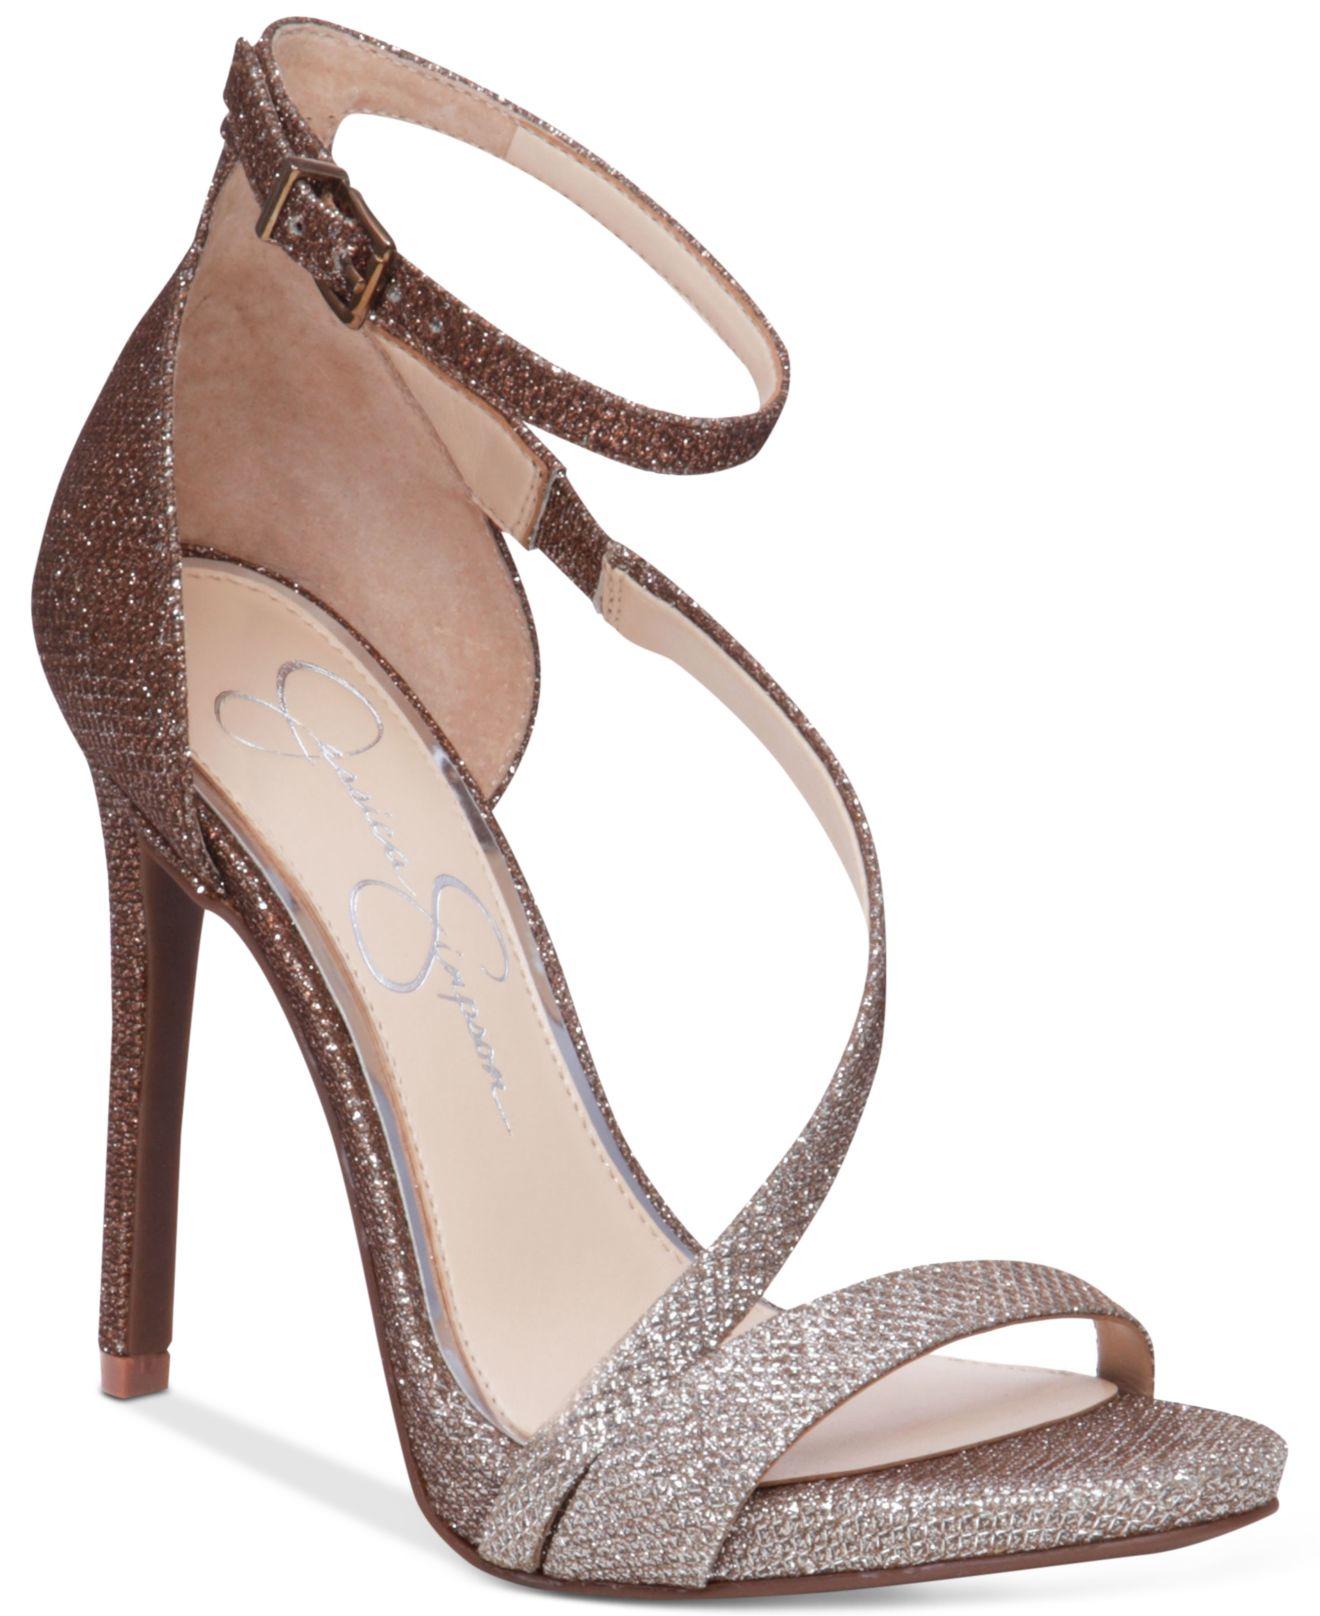 Jessica simpson Rayli Evening Dress Sandals in Metallic | Lyst